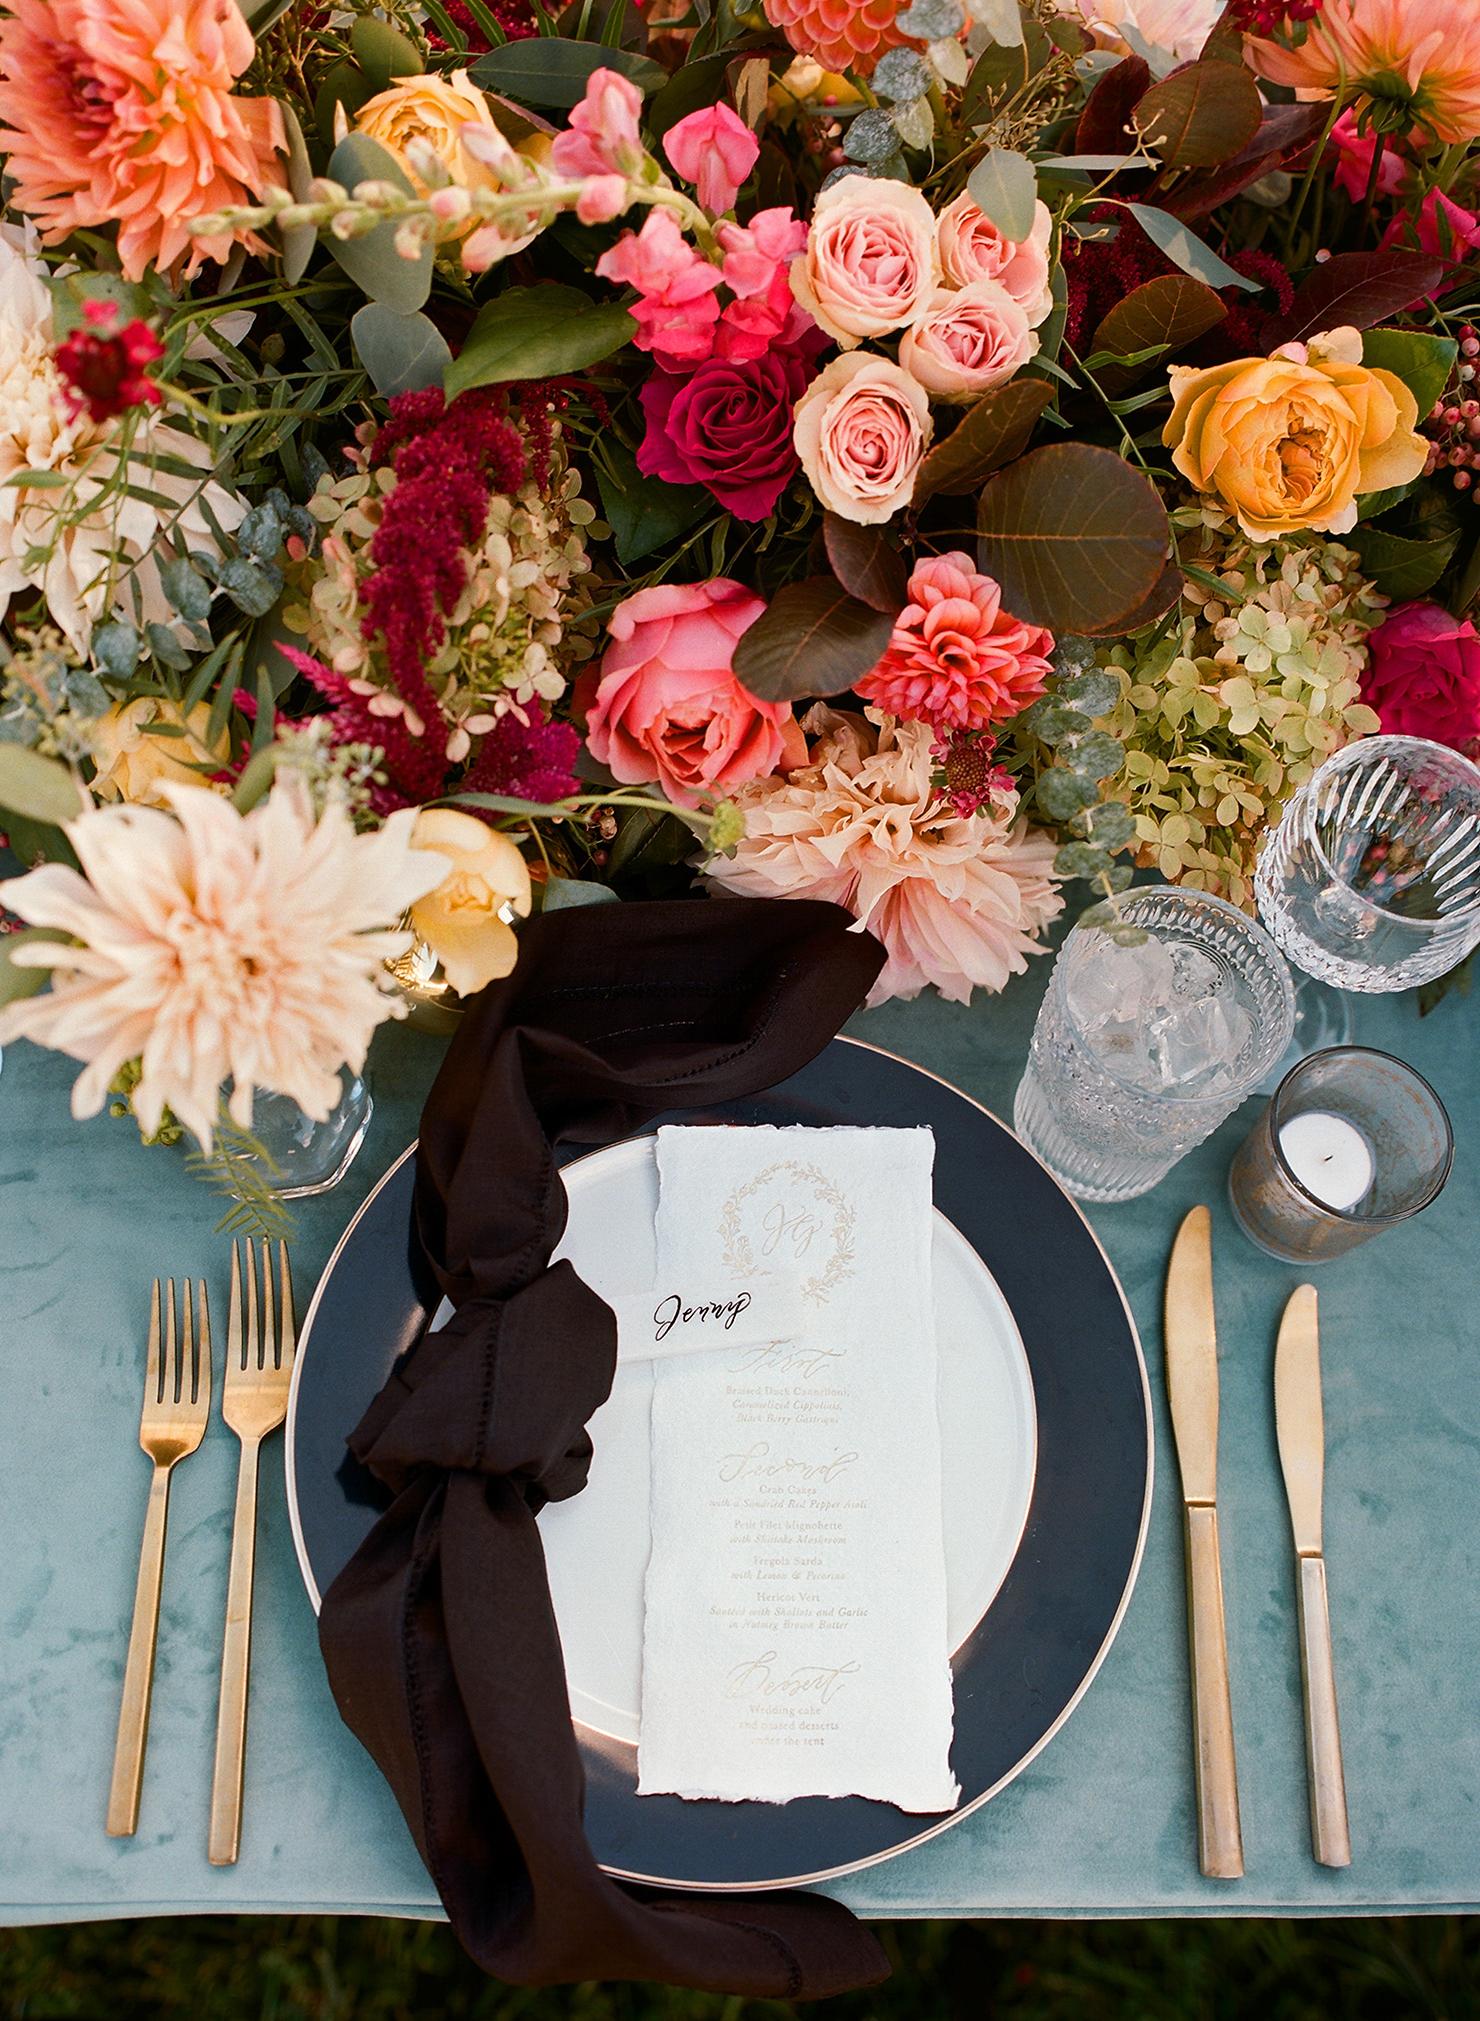 jen geoff wedding place setting and centerpiece